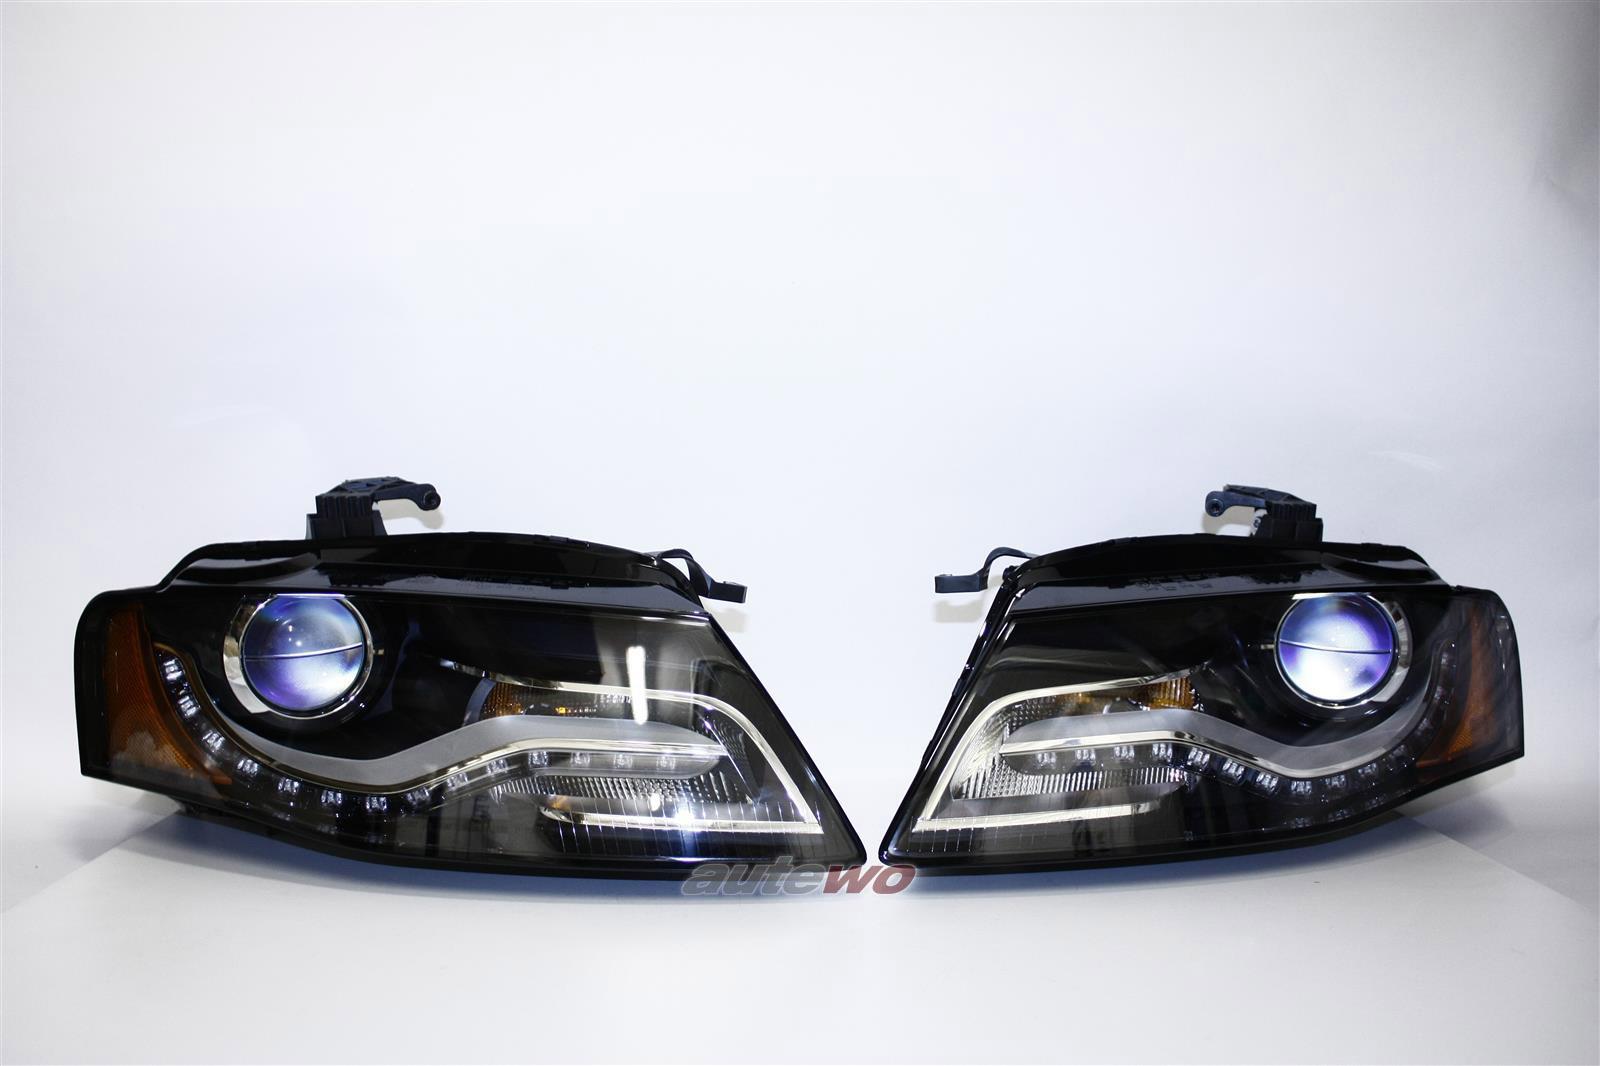 8K0941029E/AL & 8K0941030E/AL NEU Audi A4 8K BiXenon-Scheinwerfer-Set US-Modell